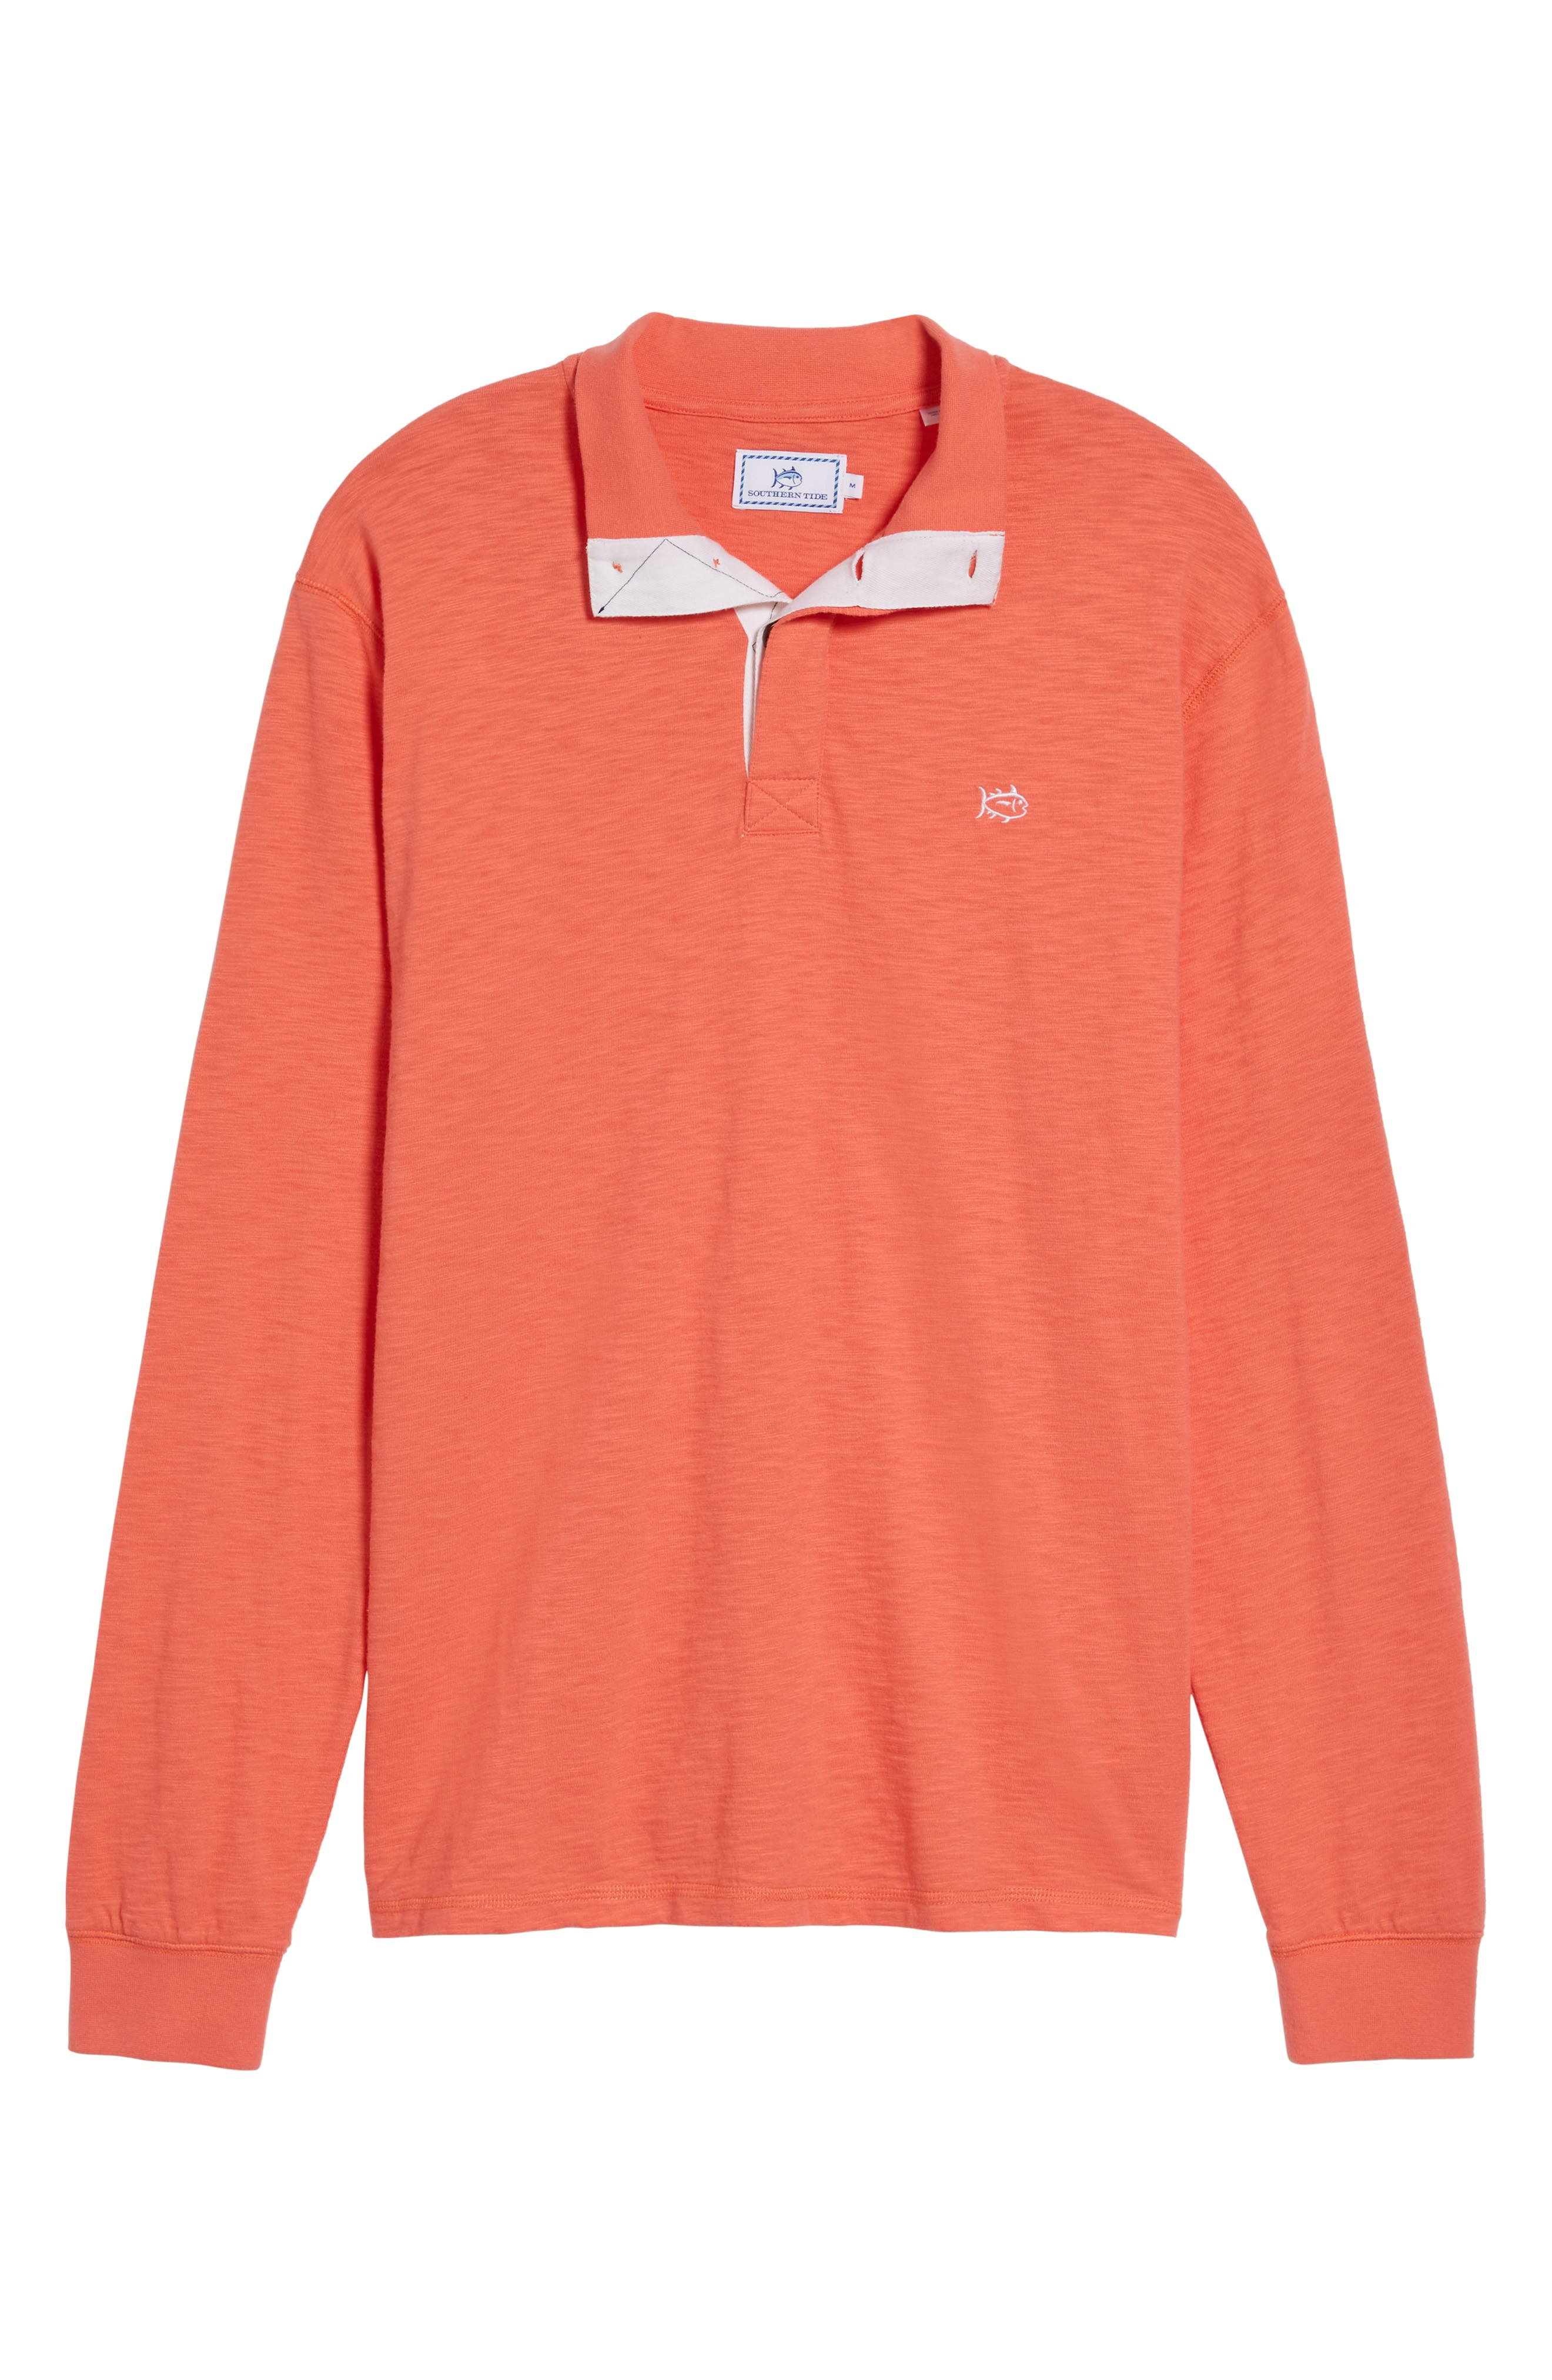 Gulf Stream Sweatshirt,                             Alternate thumbnail 6, color,                             Melon